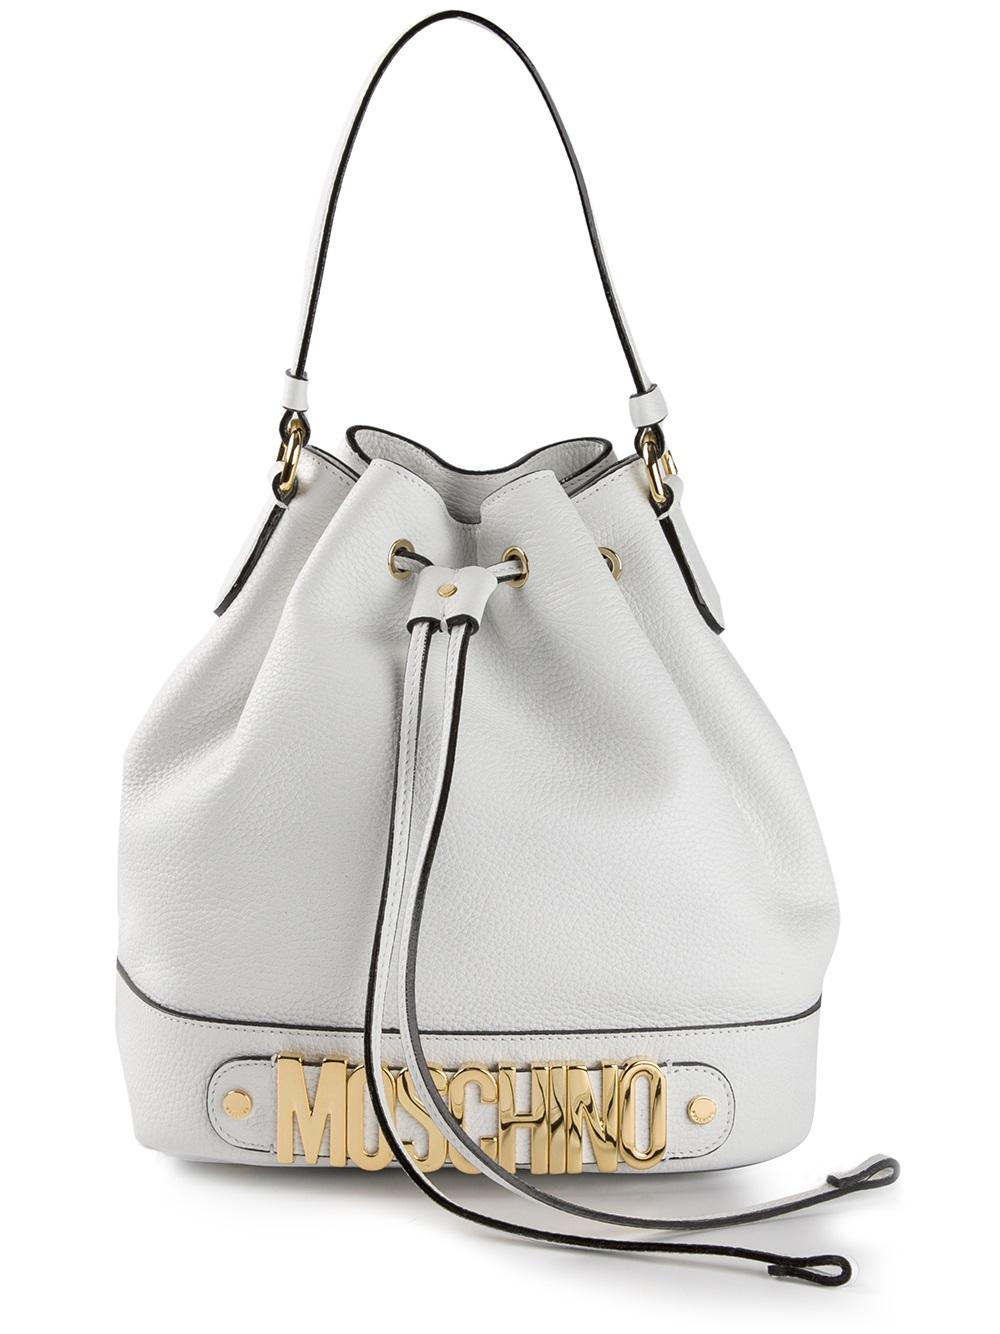 Moschino Logo Bucket Bag In White Lyst